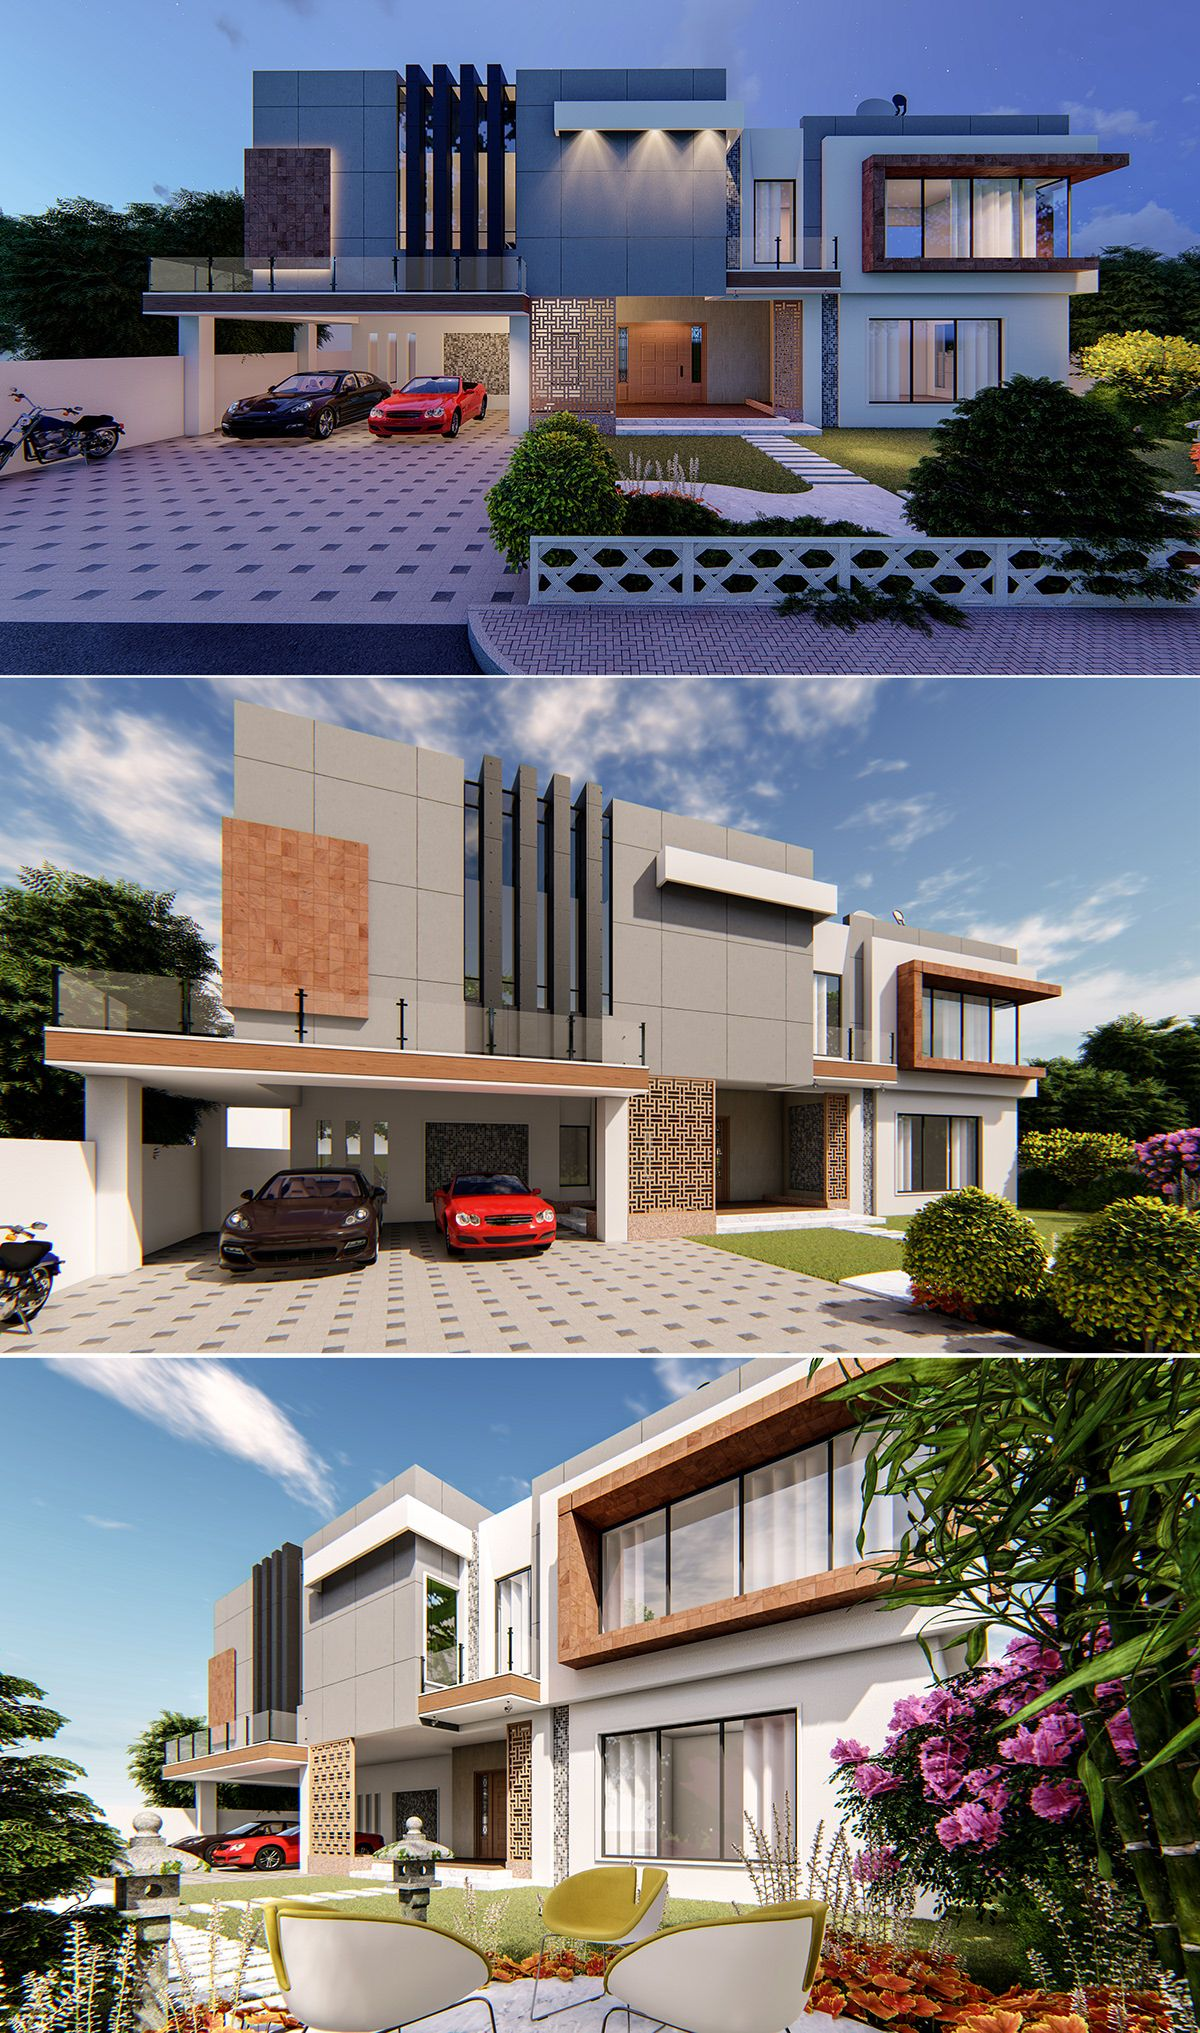 House Exterior on Behance | Village house design, Modern ...